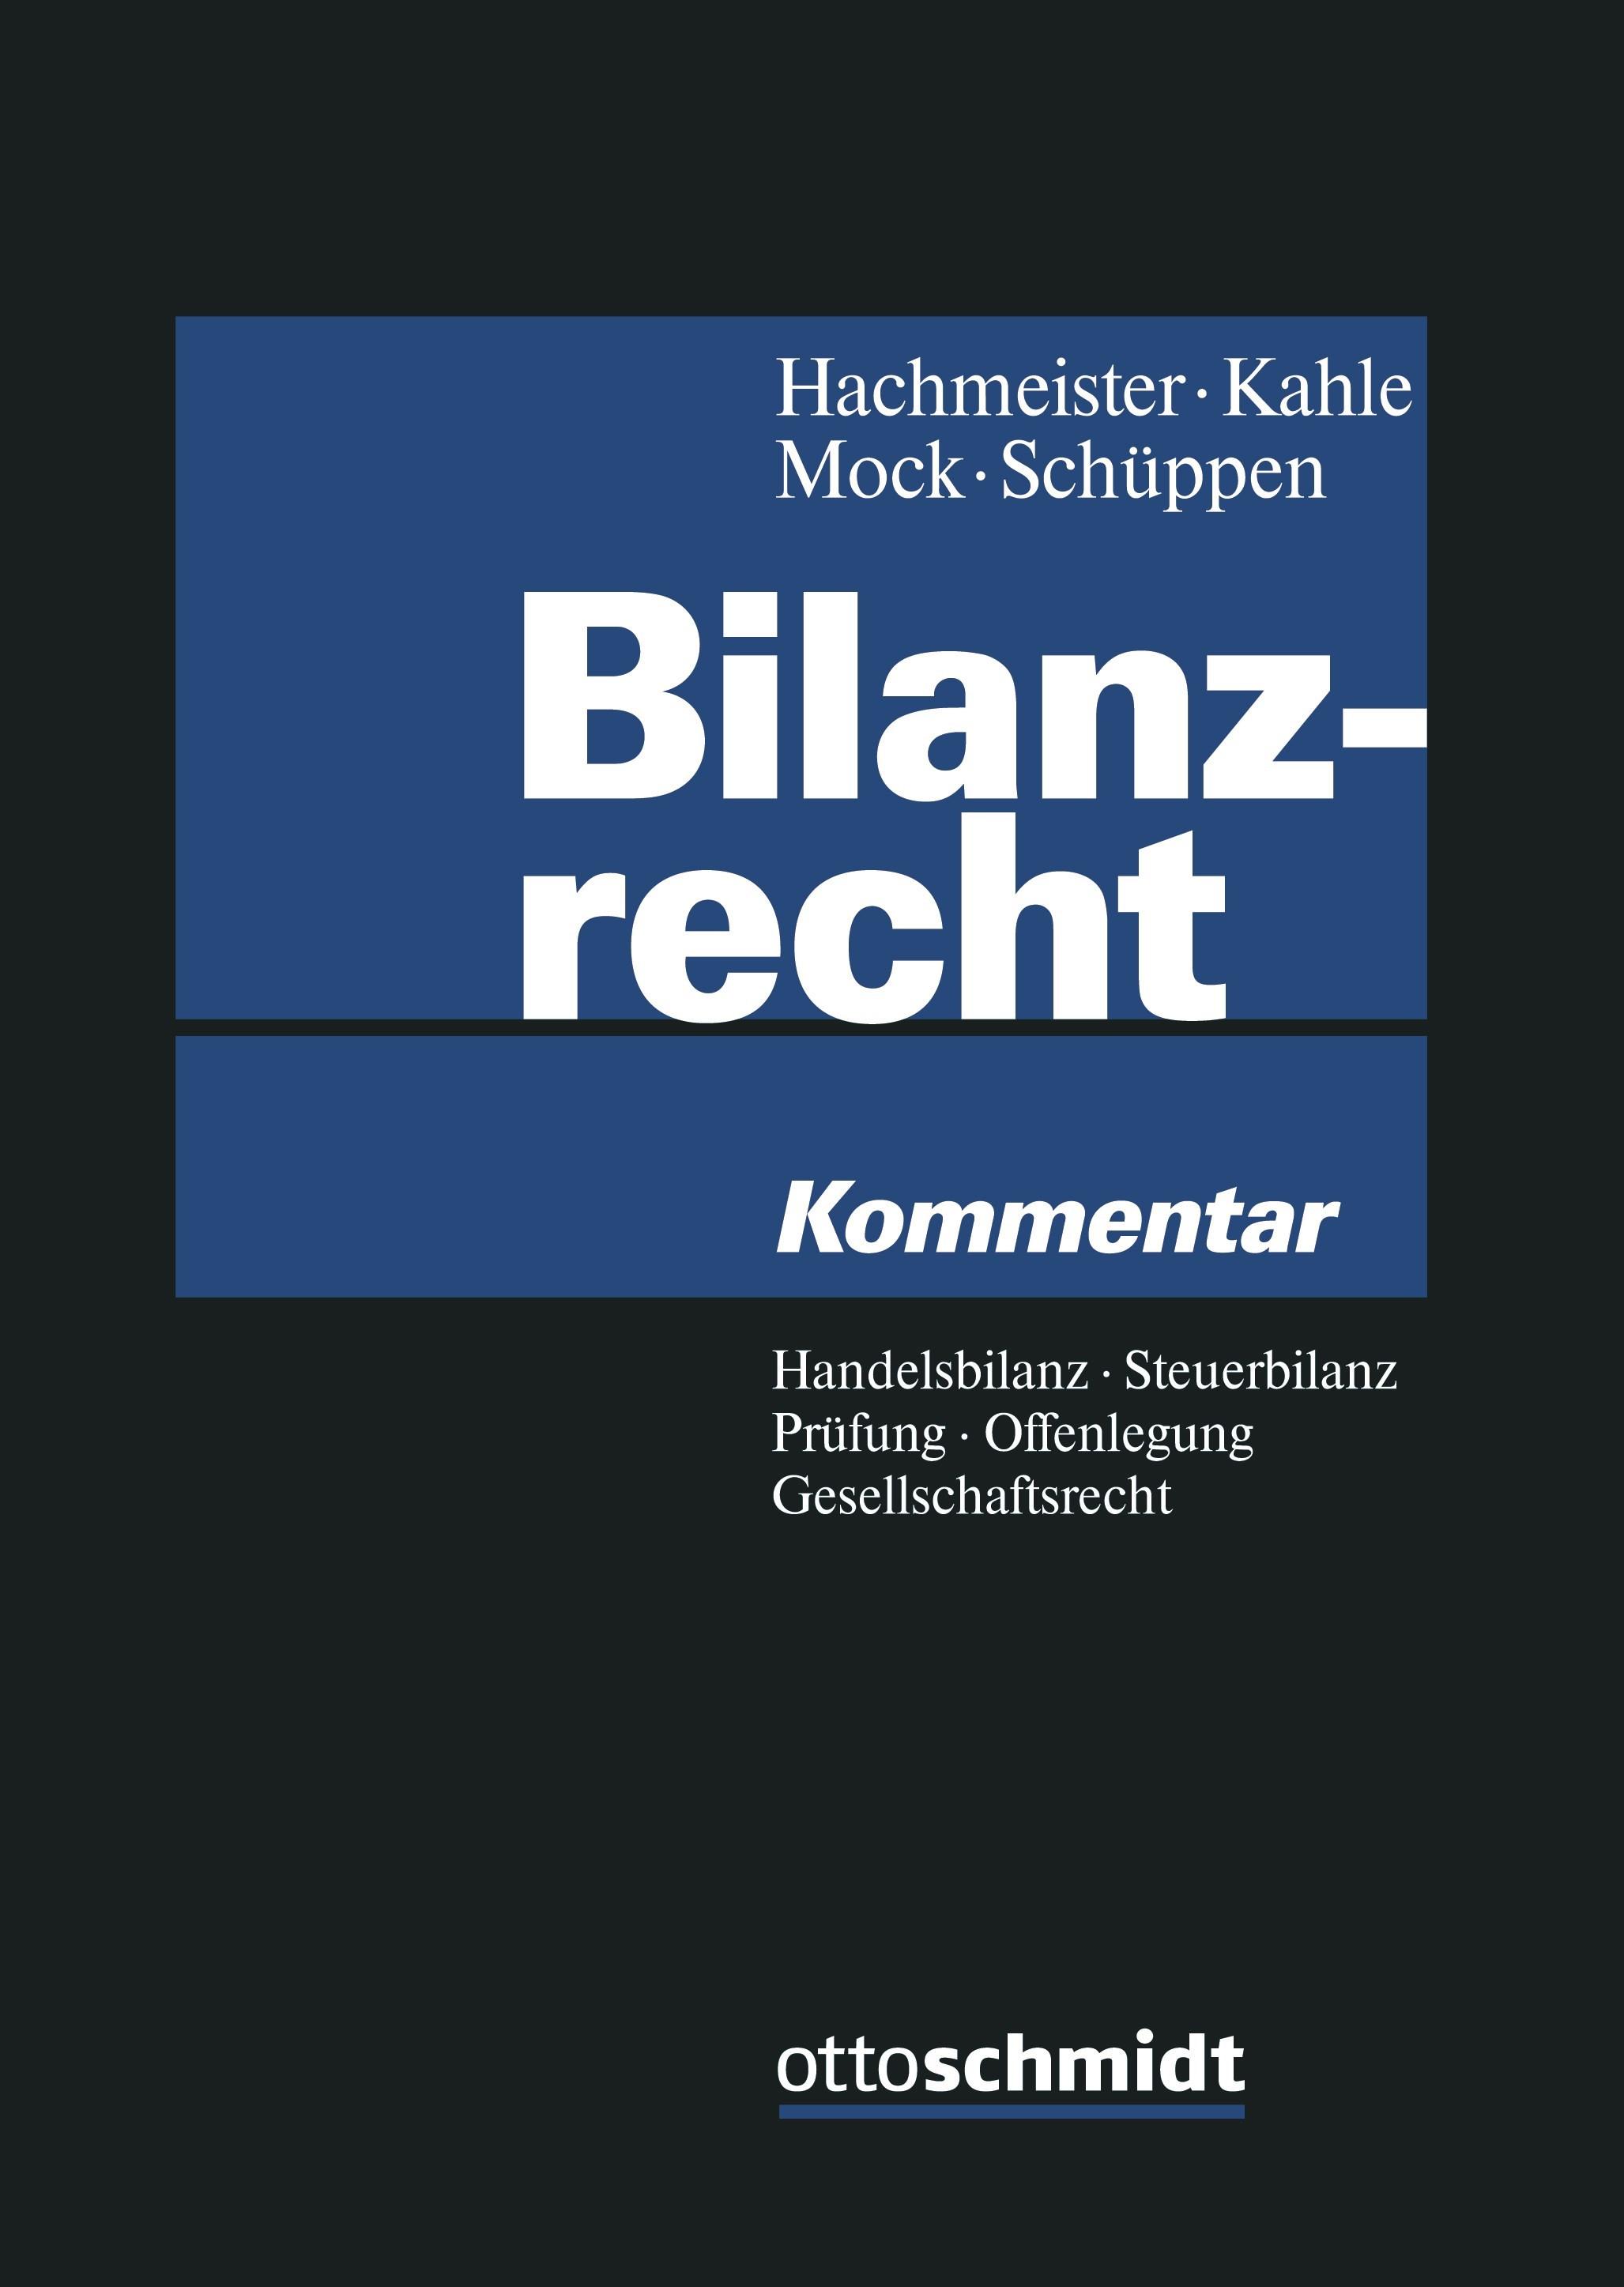 Bilanzrecht | Hachmeister / Kahle / Mock / Schüppen, 2017 | Buch (Cover)